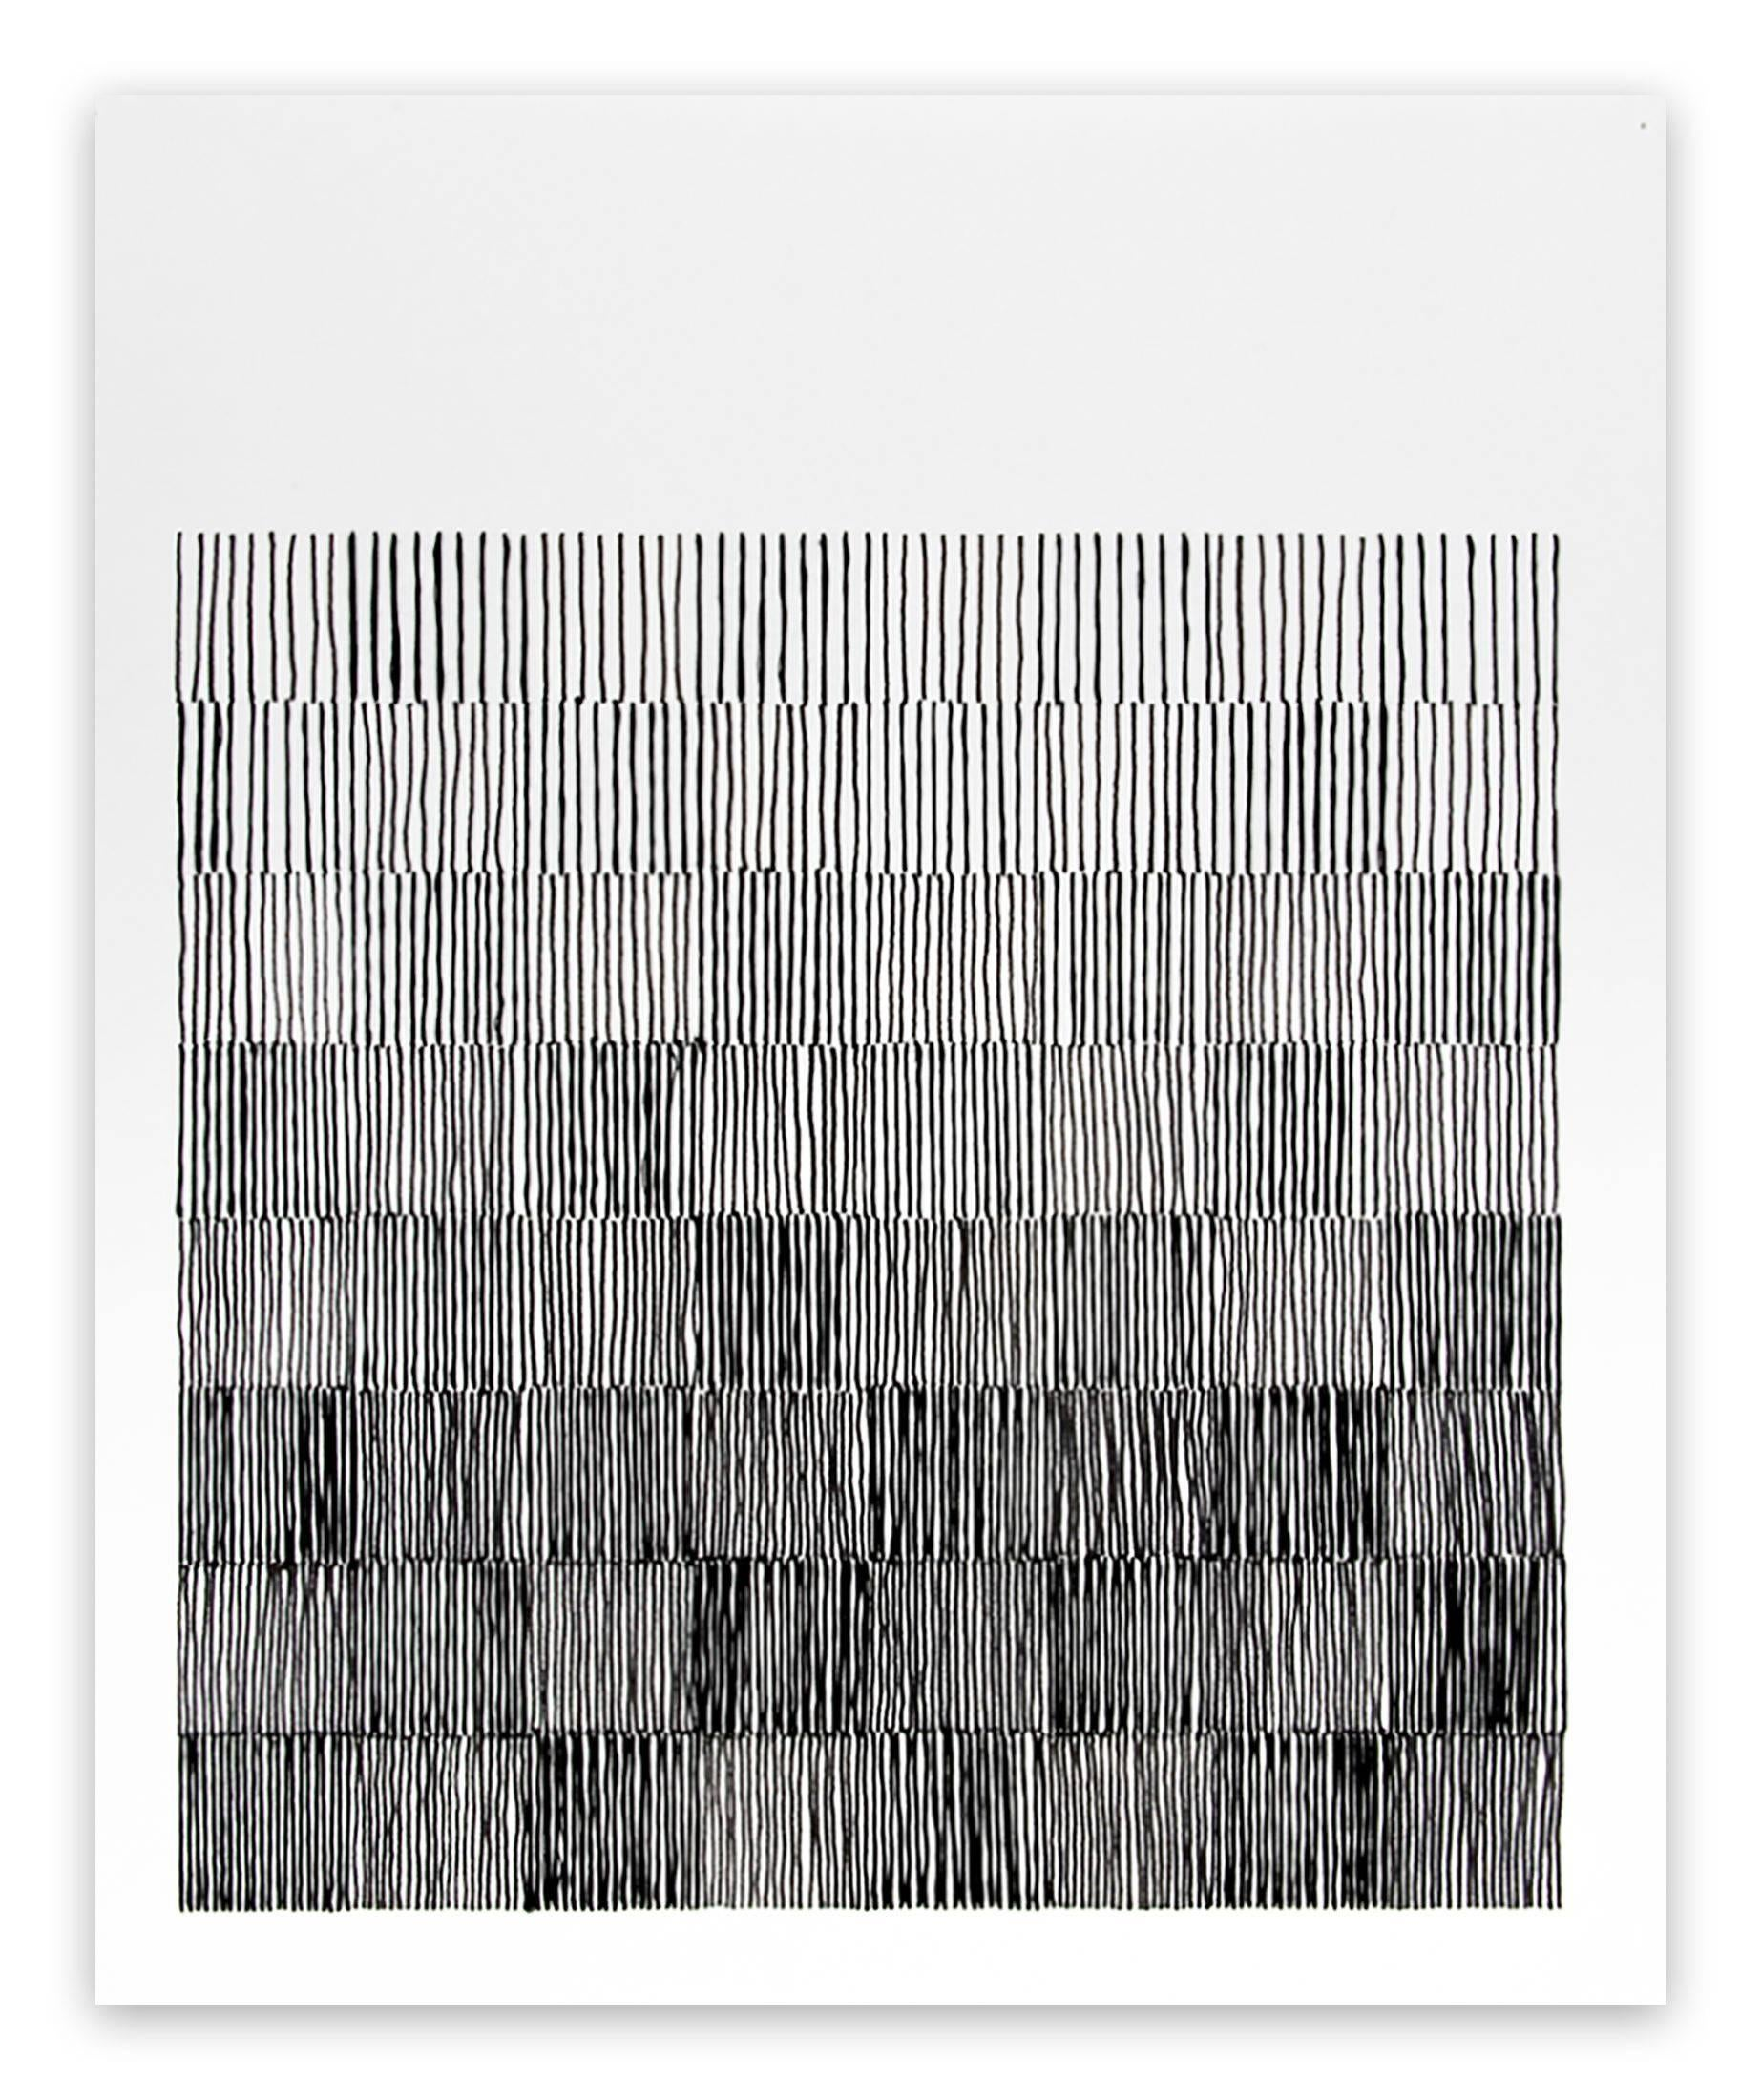 NB. 15 (Abstract drawing)